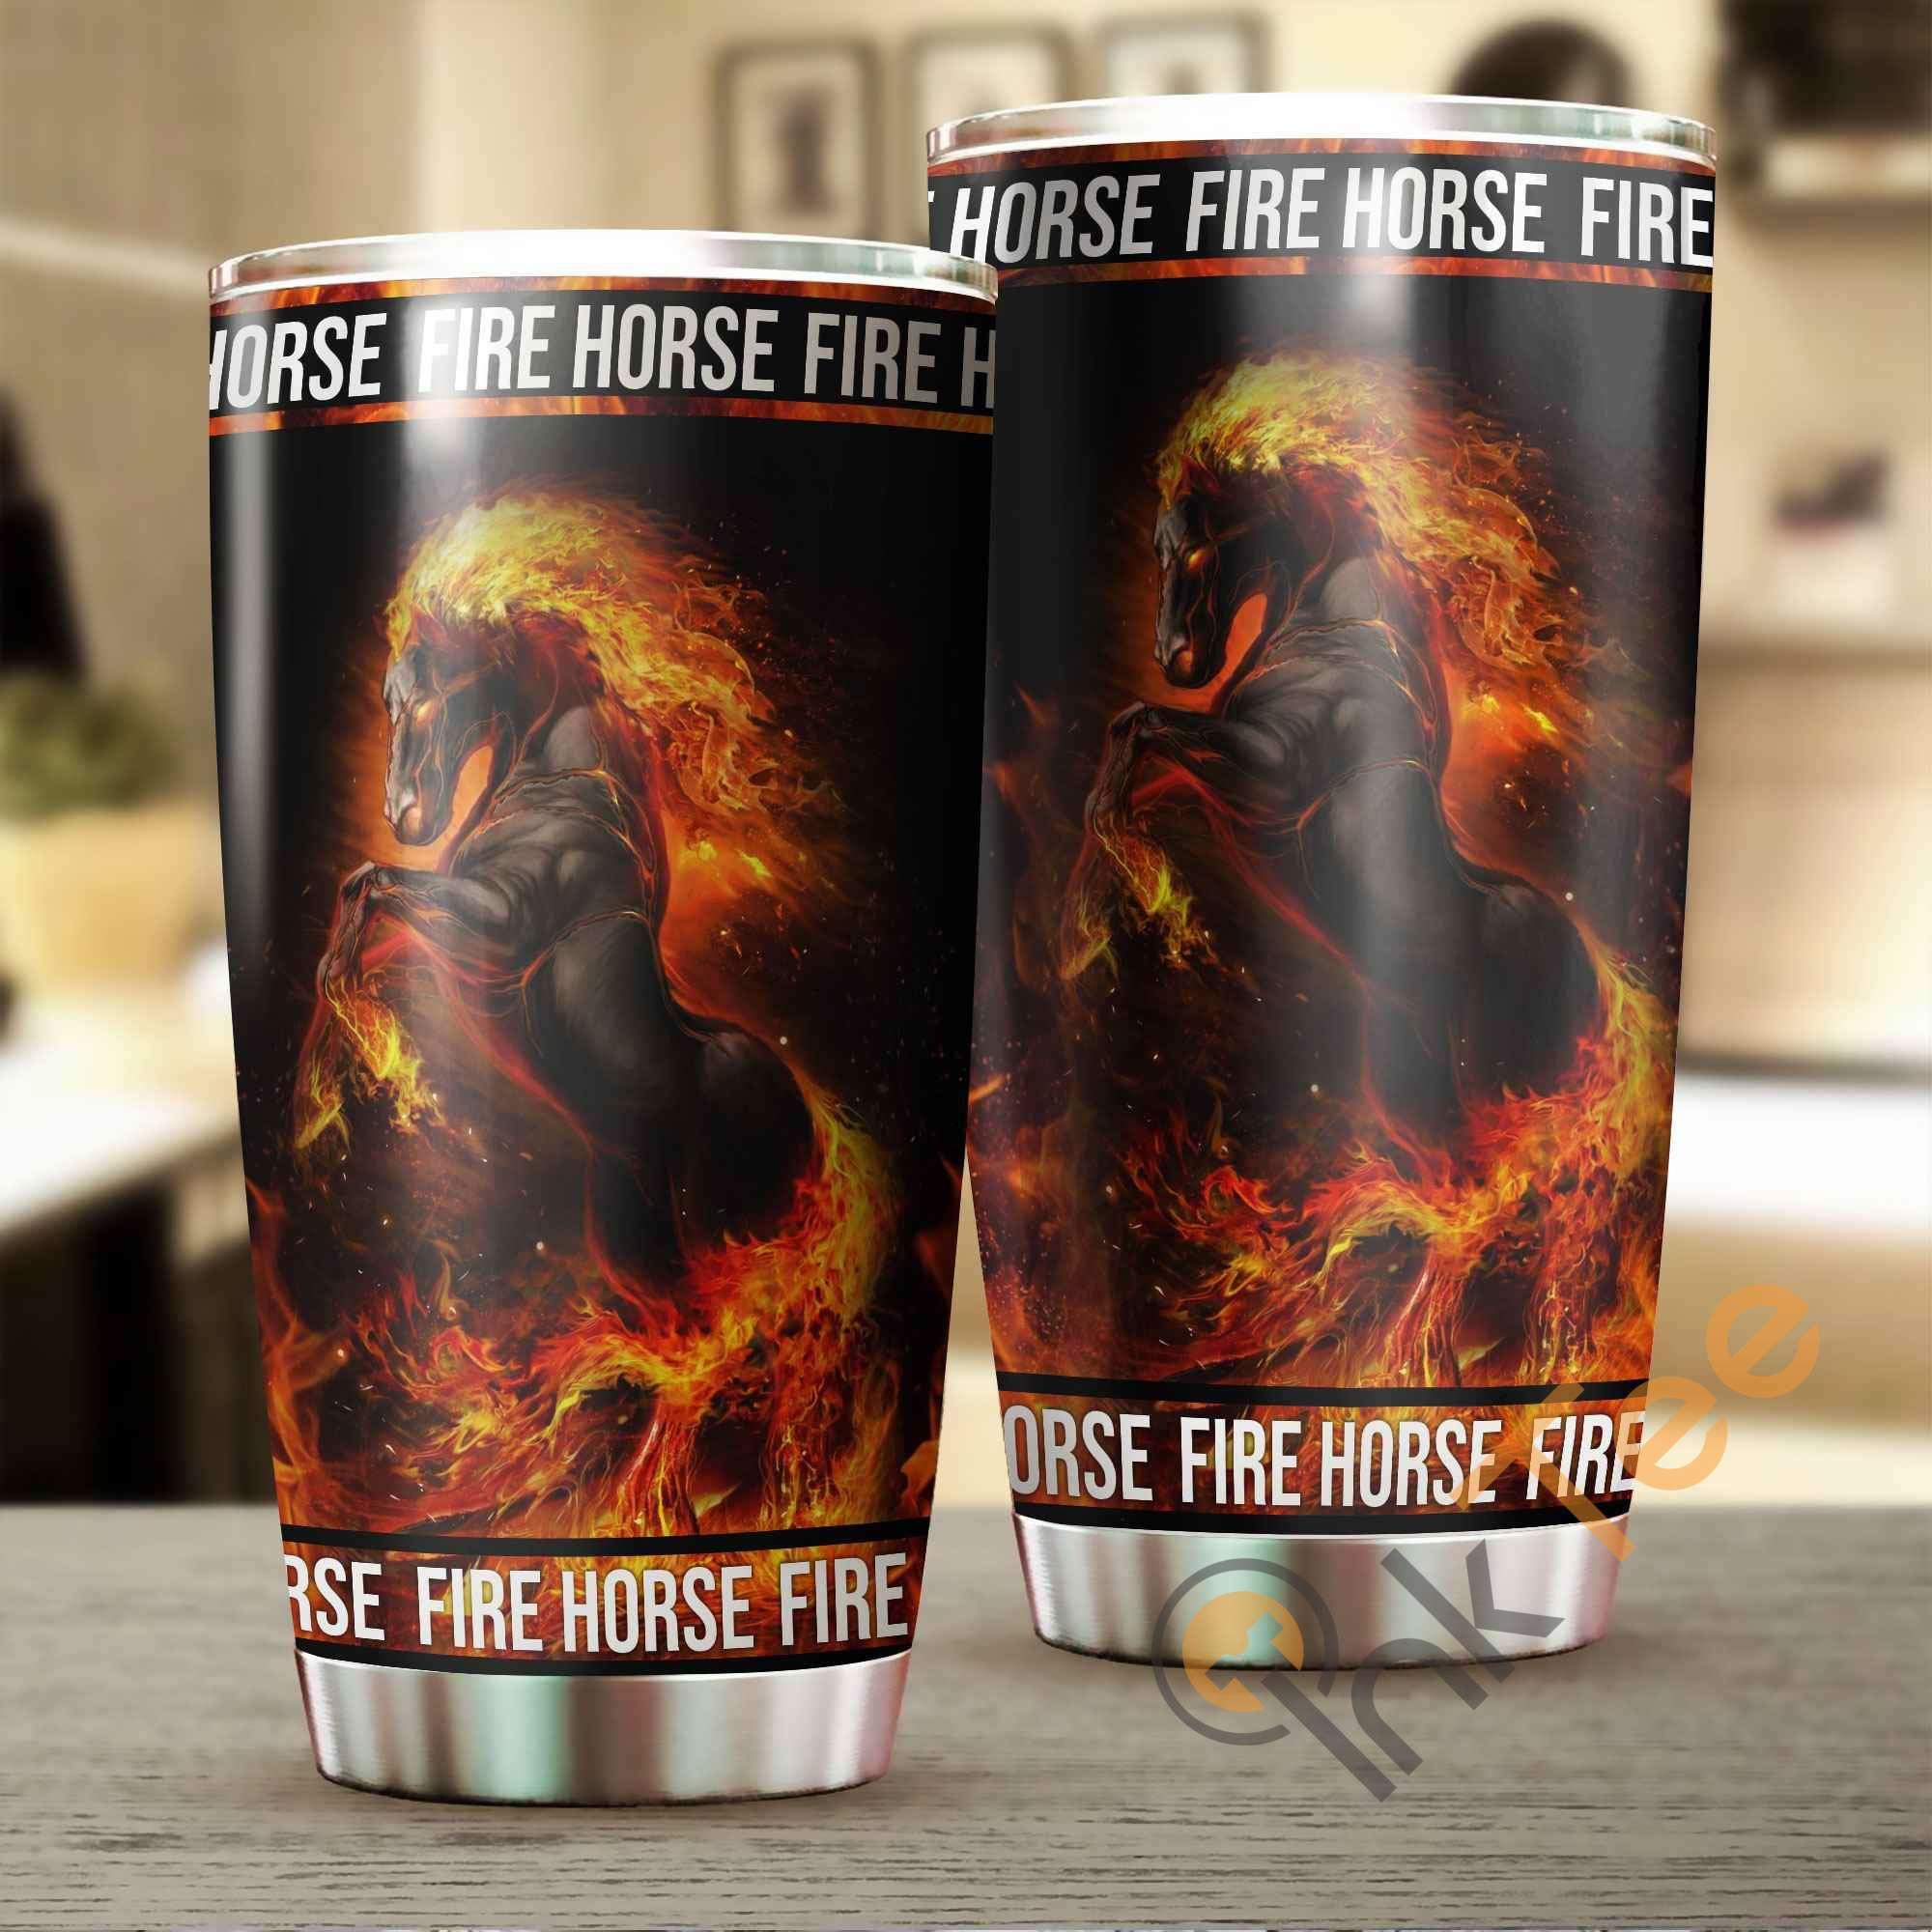 Beautiful Fire Horse Amazon Best Seller Sku 3599 Stainless Steel Tumbler